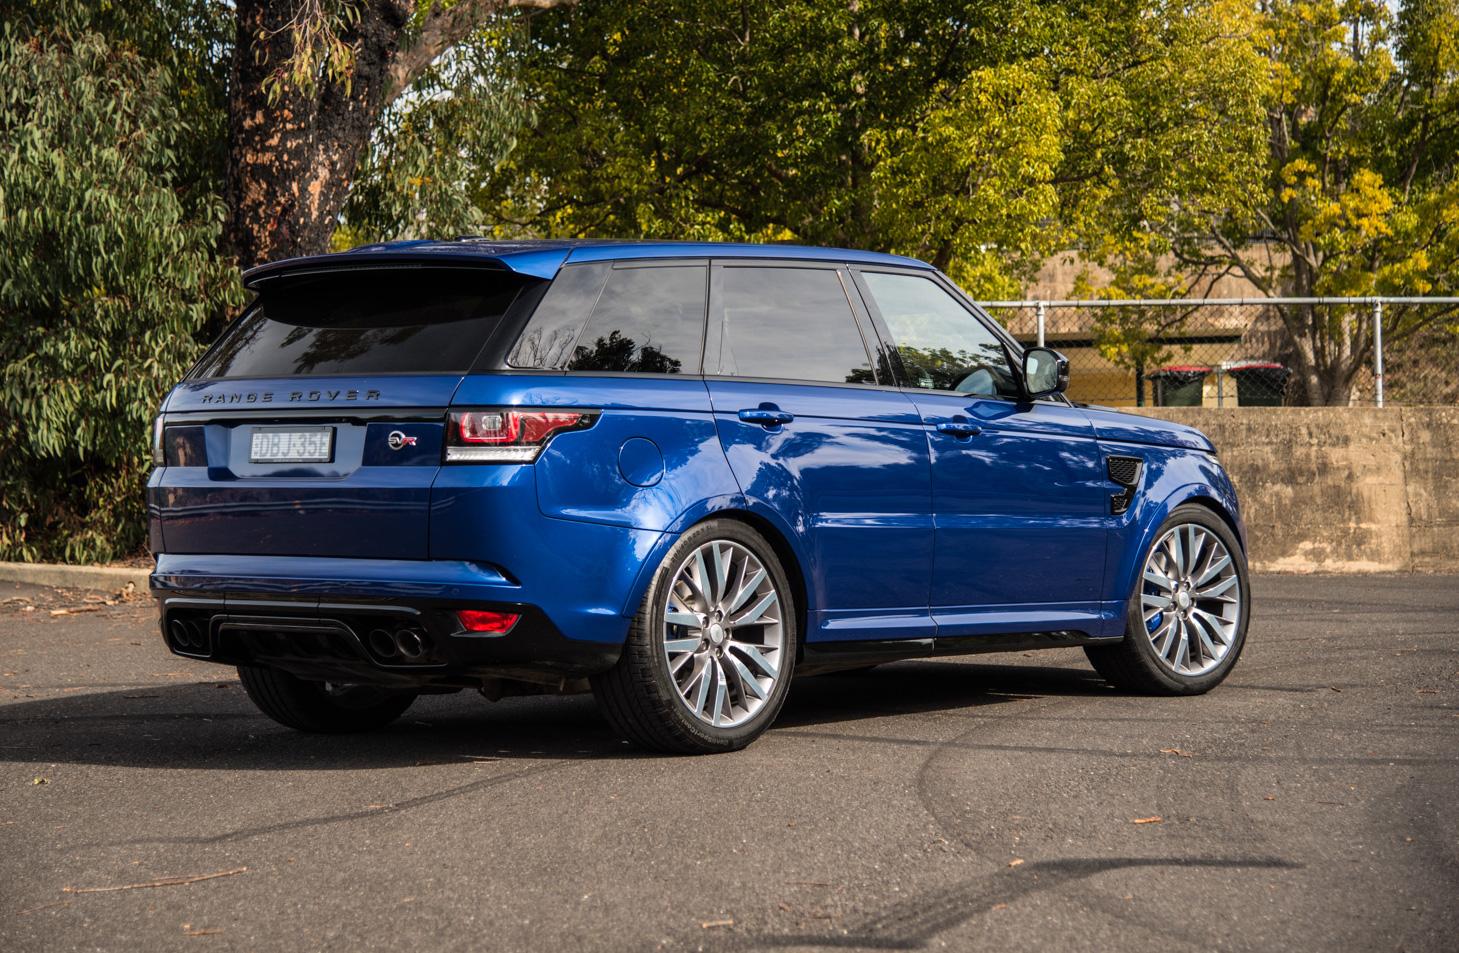 Range Rover Sport Svr Review First Impressions Pov